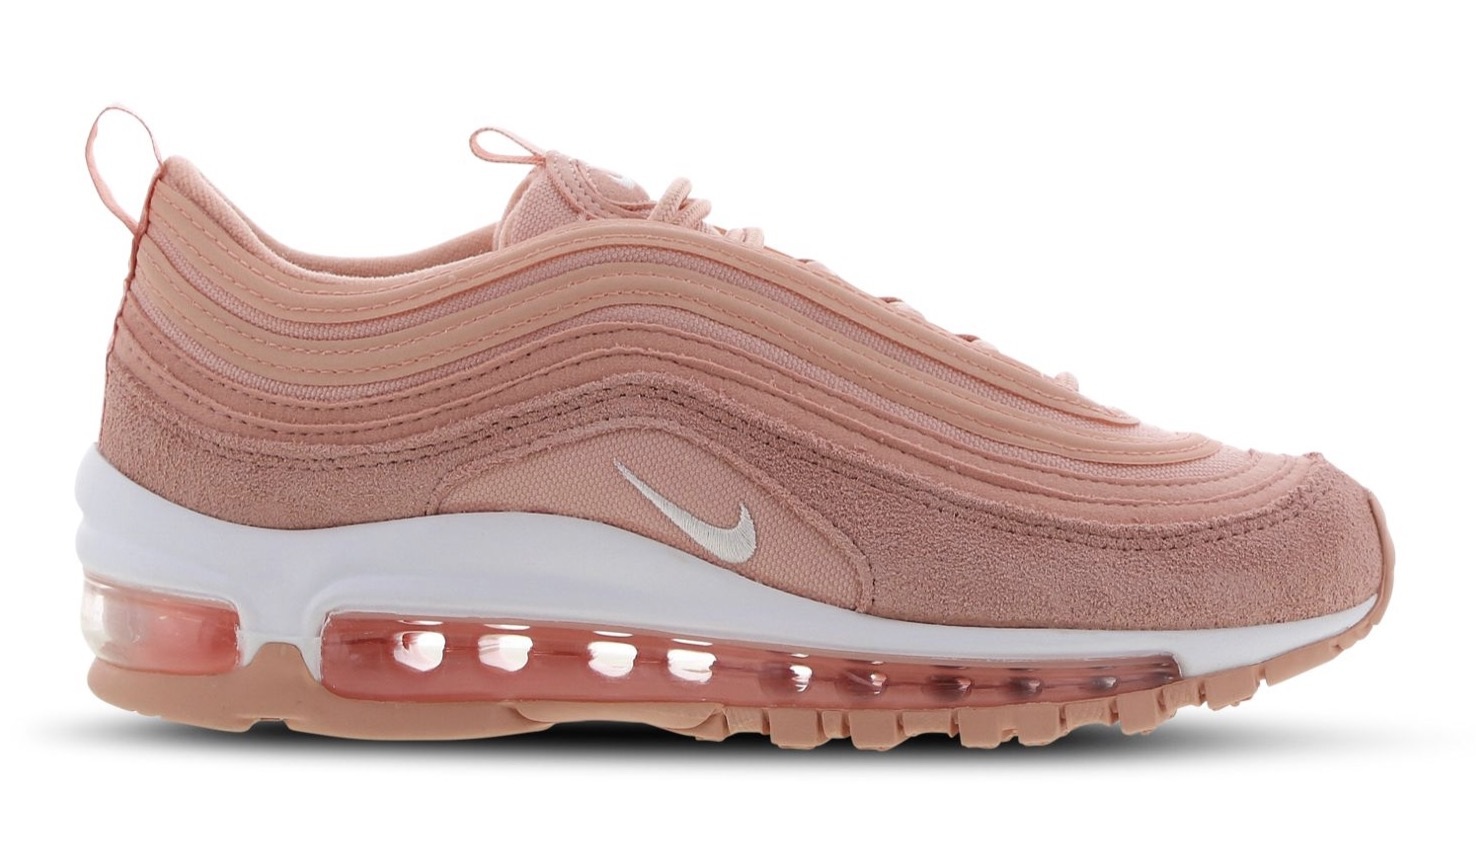 Nike Air Max 97 Coral Stardust Pink | BQ7231 600